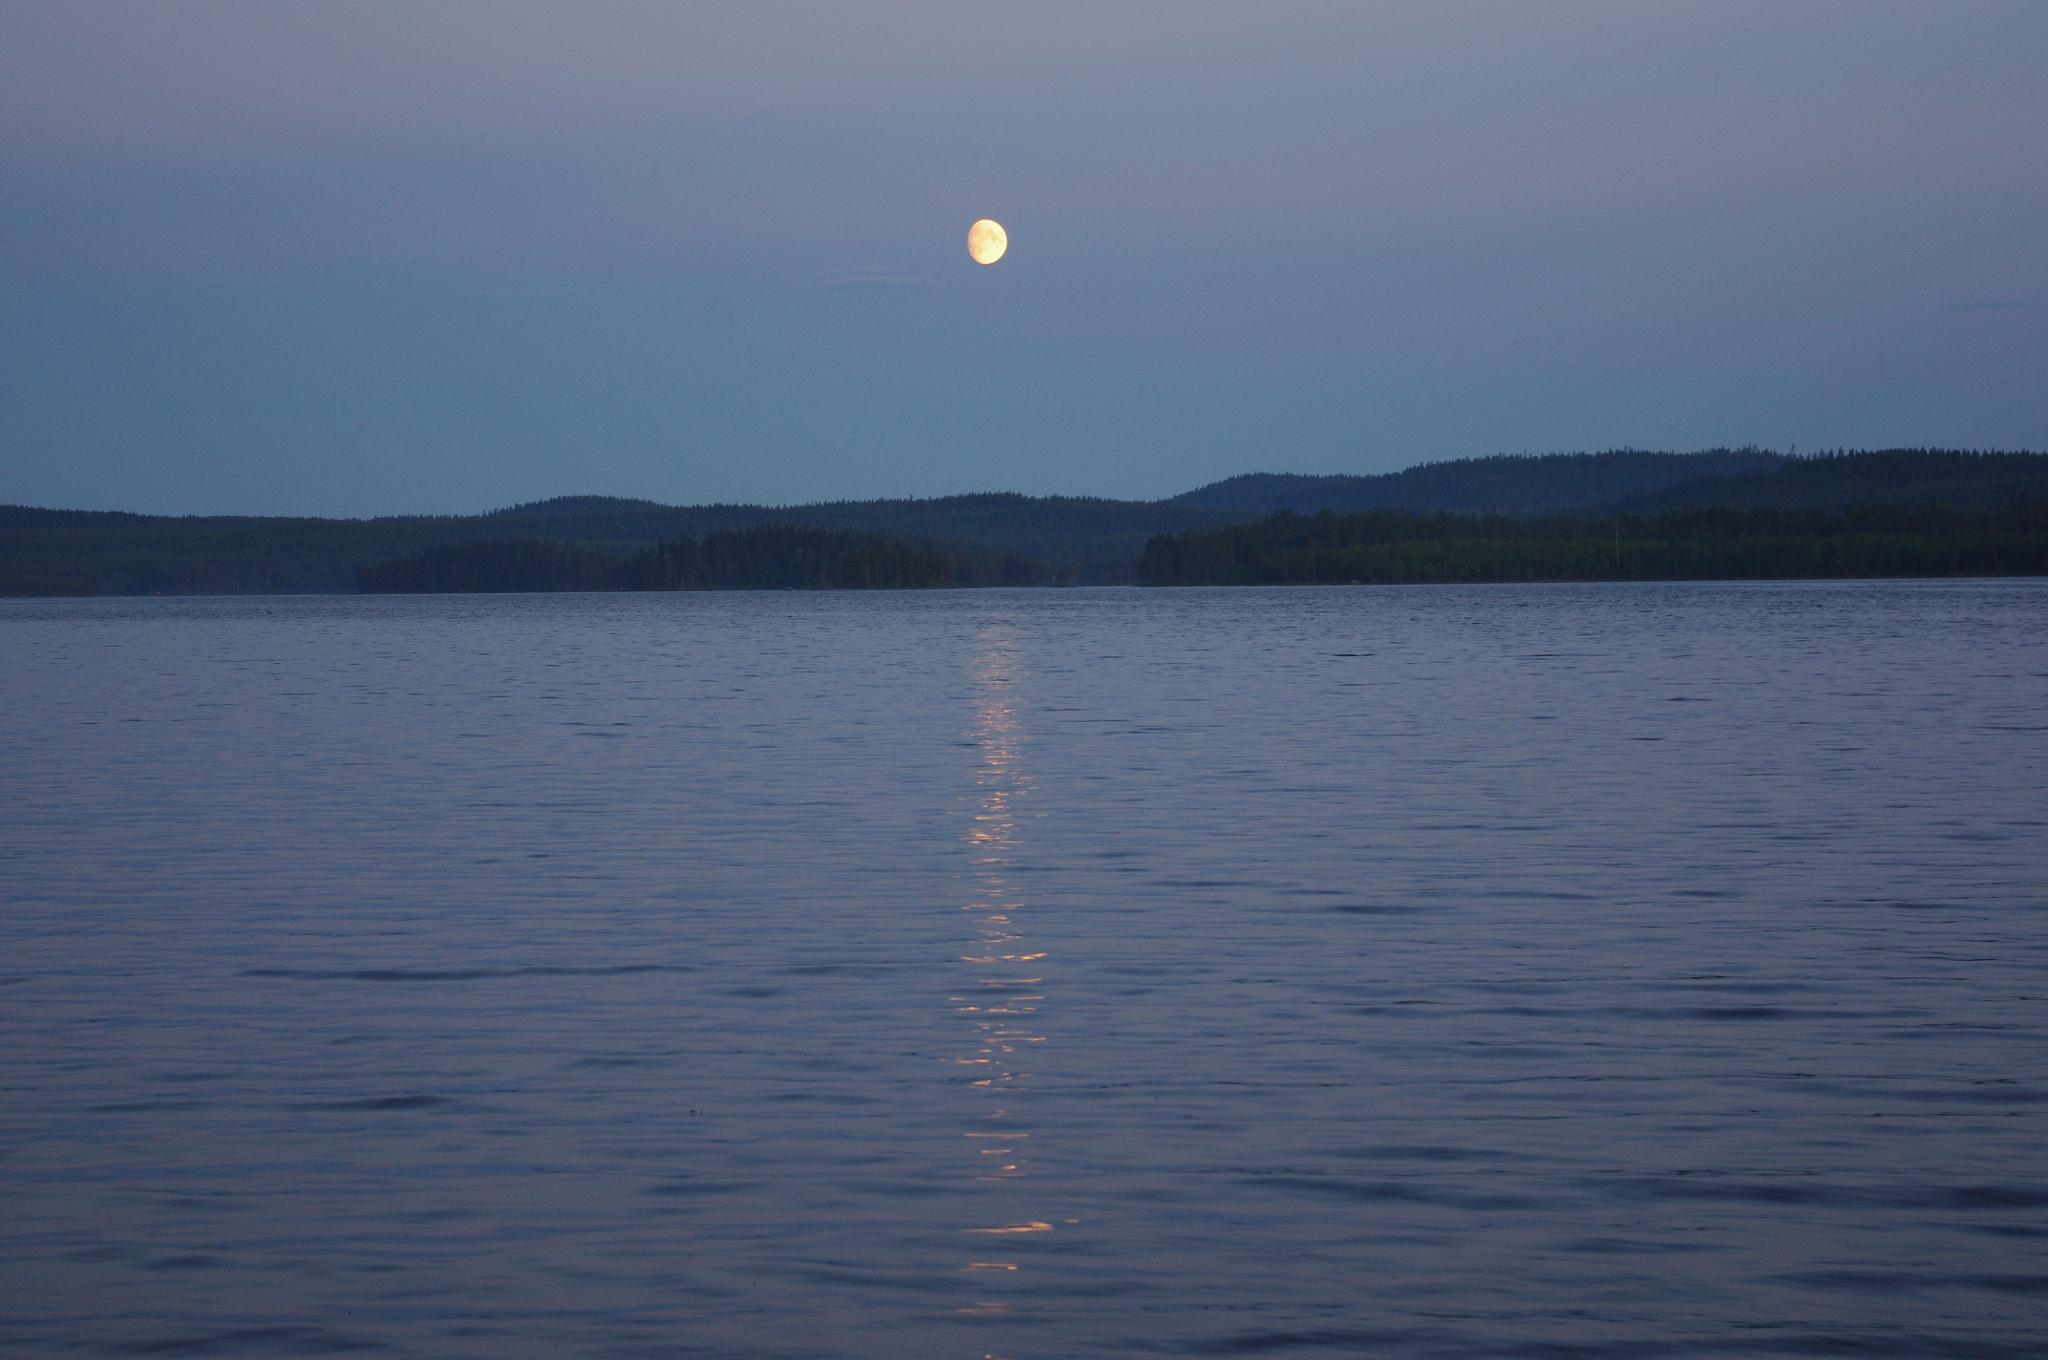 Midnight moon by eva.e.mabrouk